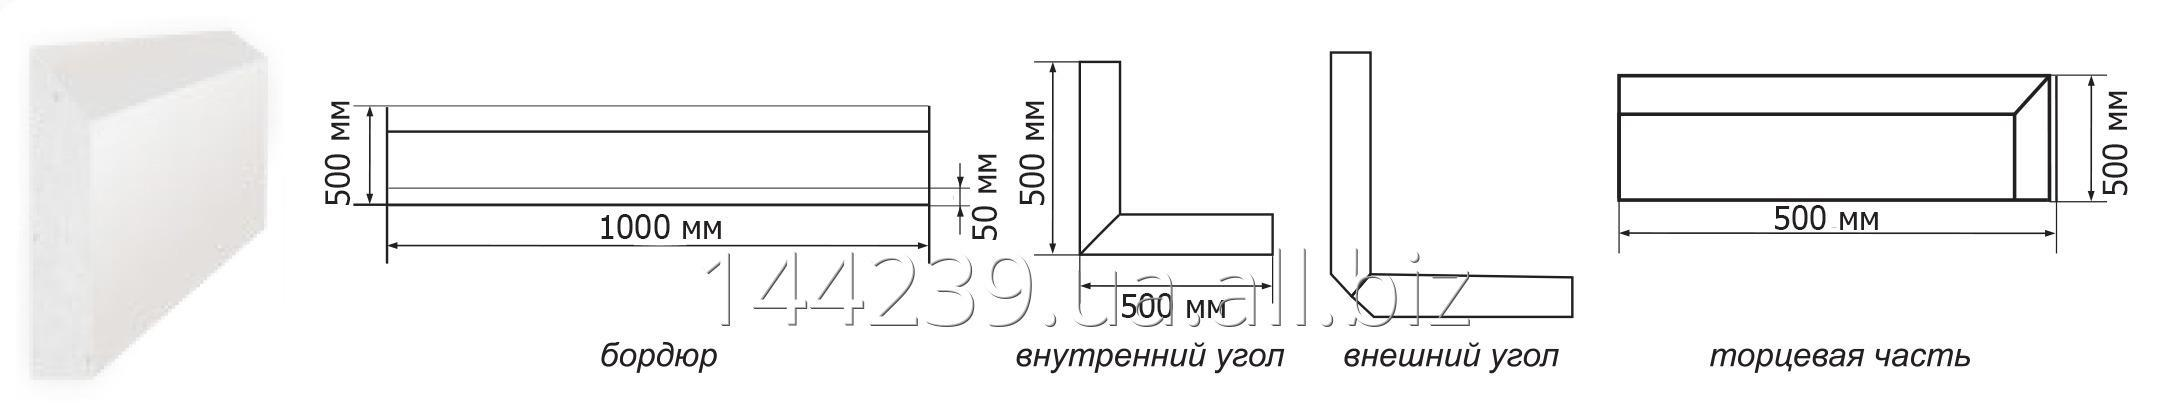 bordyur_zashhitnyj_politon_bru_50_p